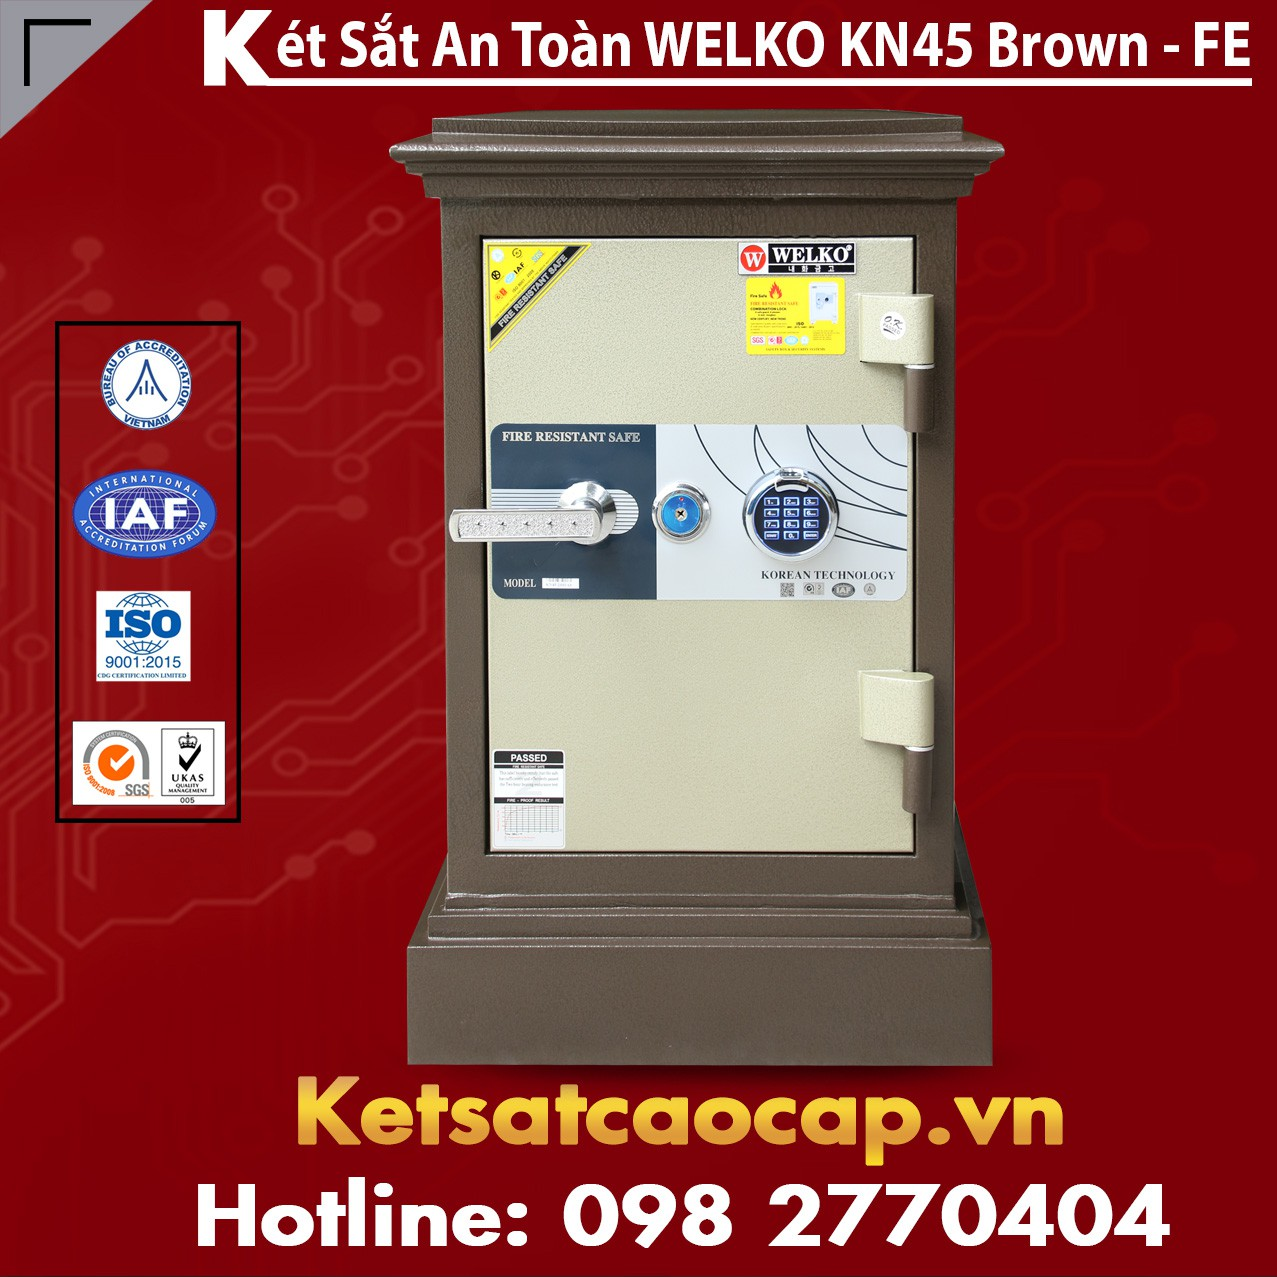 Két Sắt Khoá Vân Tay WELKO KN45 Brown - FE